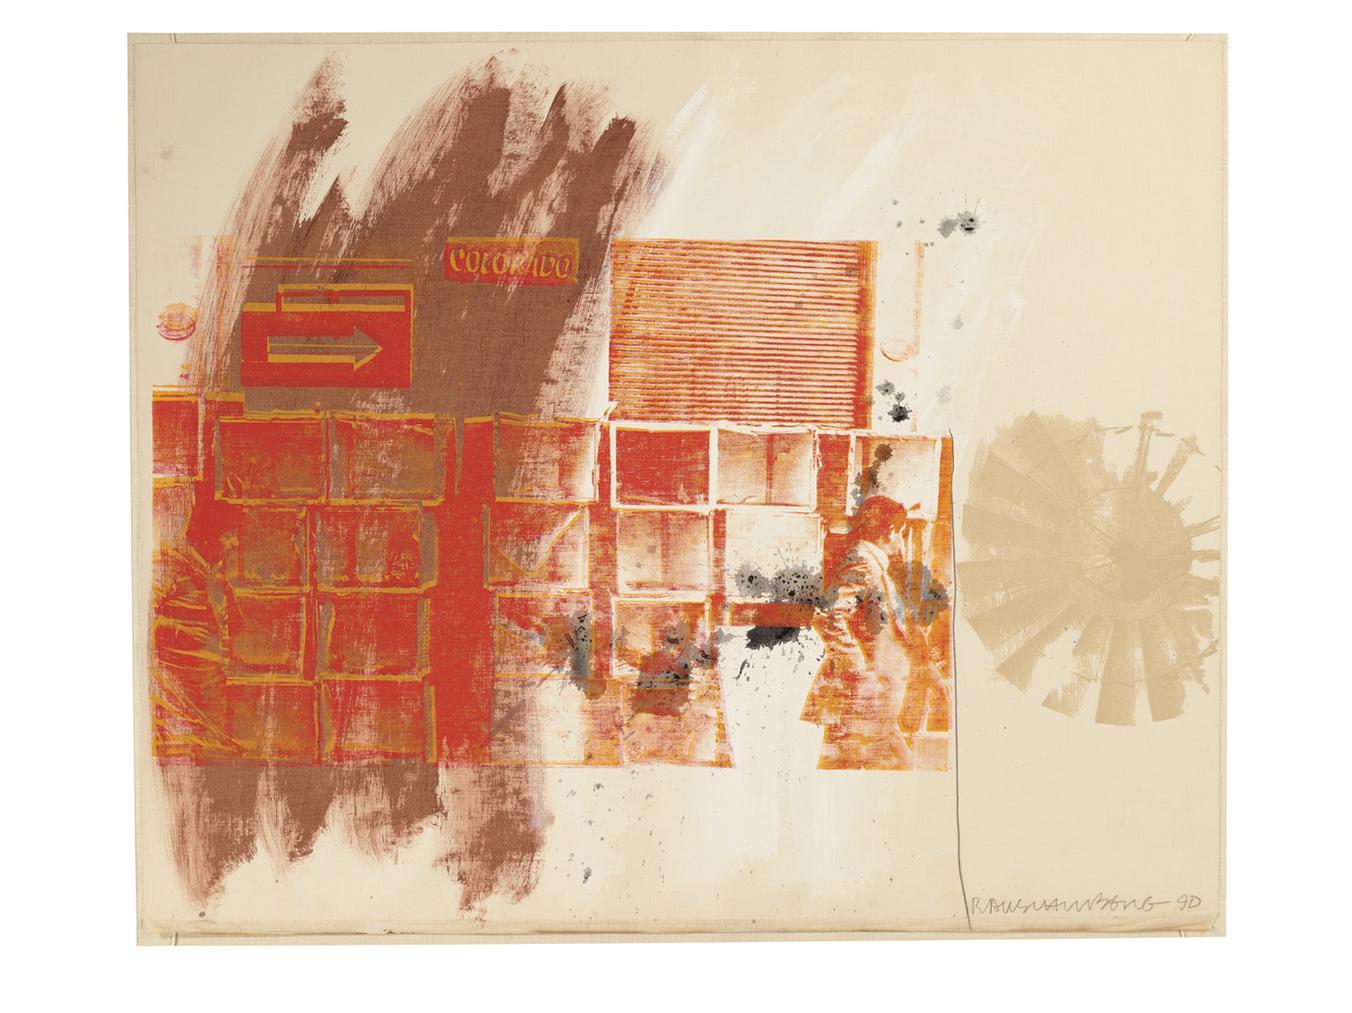 Robert Rauschenberg-Red Spinner-1990